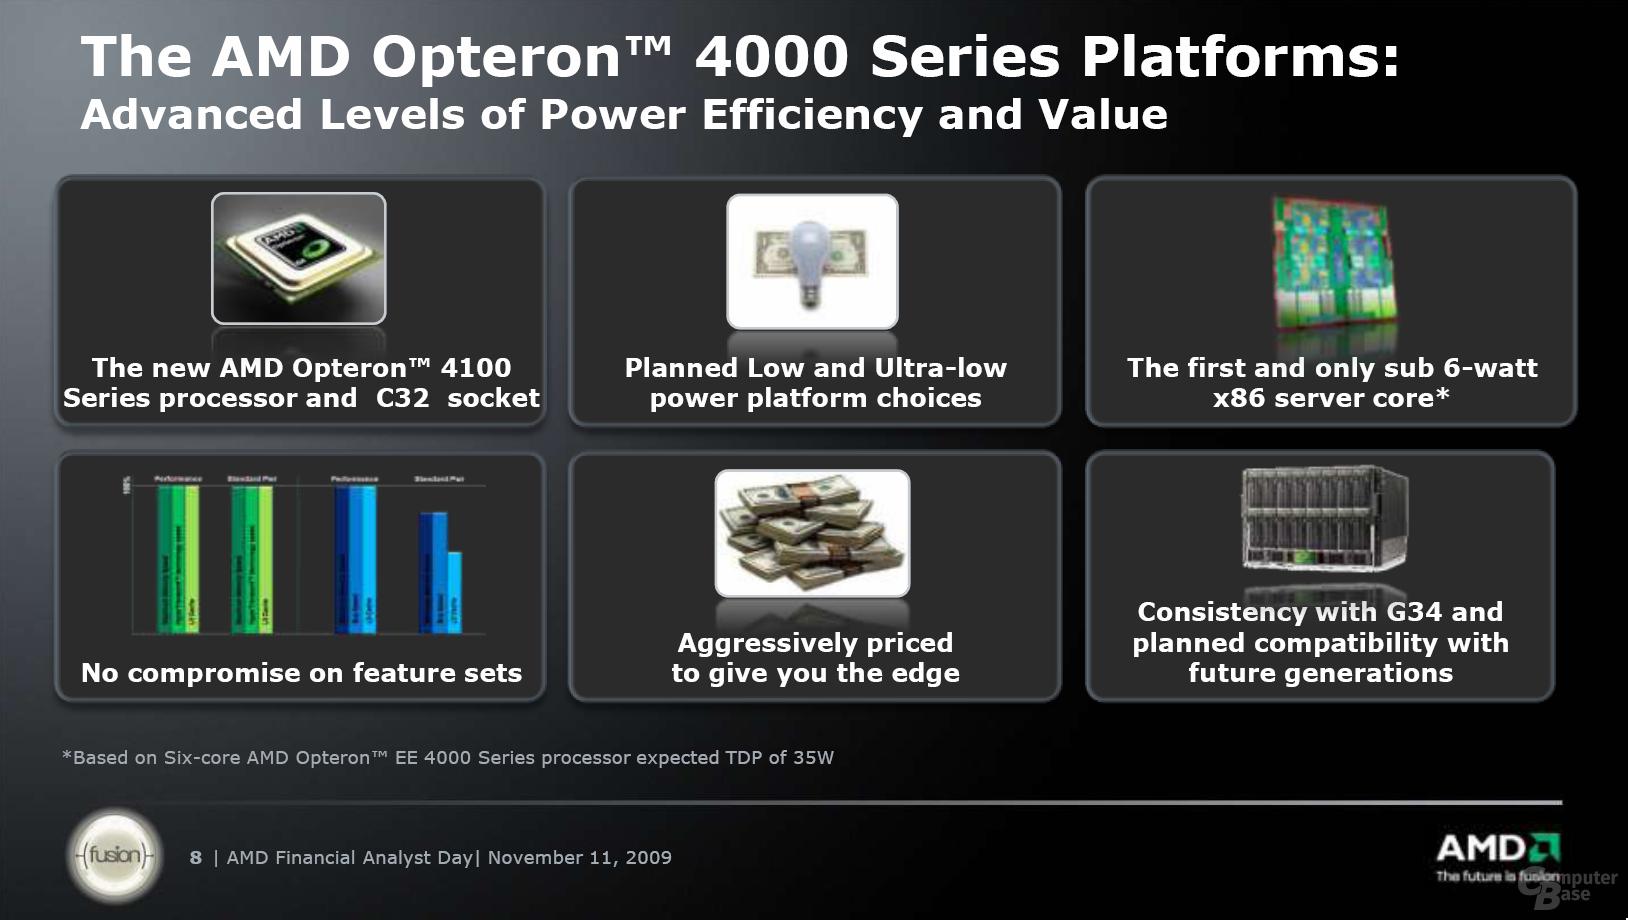 AMD Opteron 4000 auf Basis des C32-Sockels